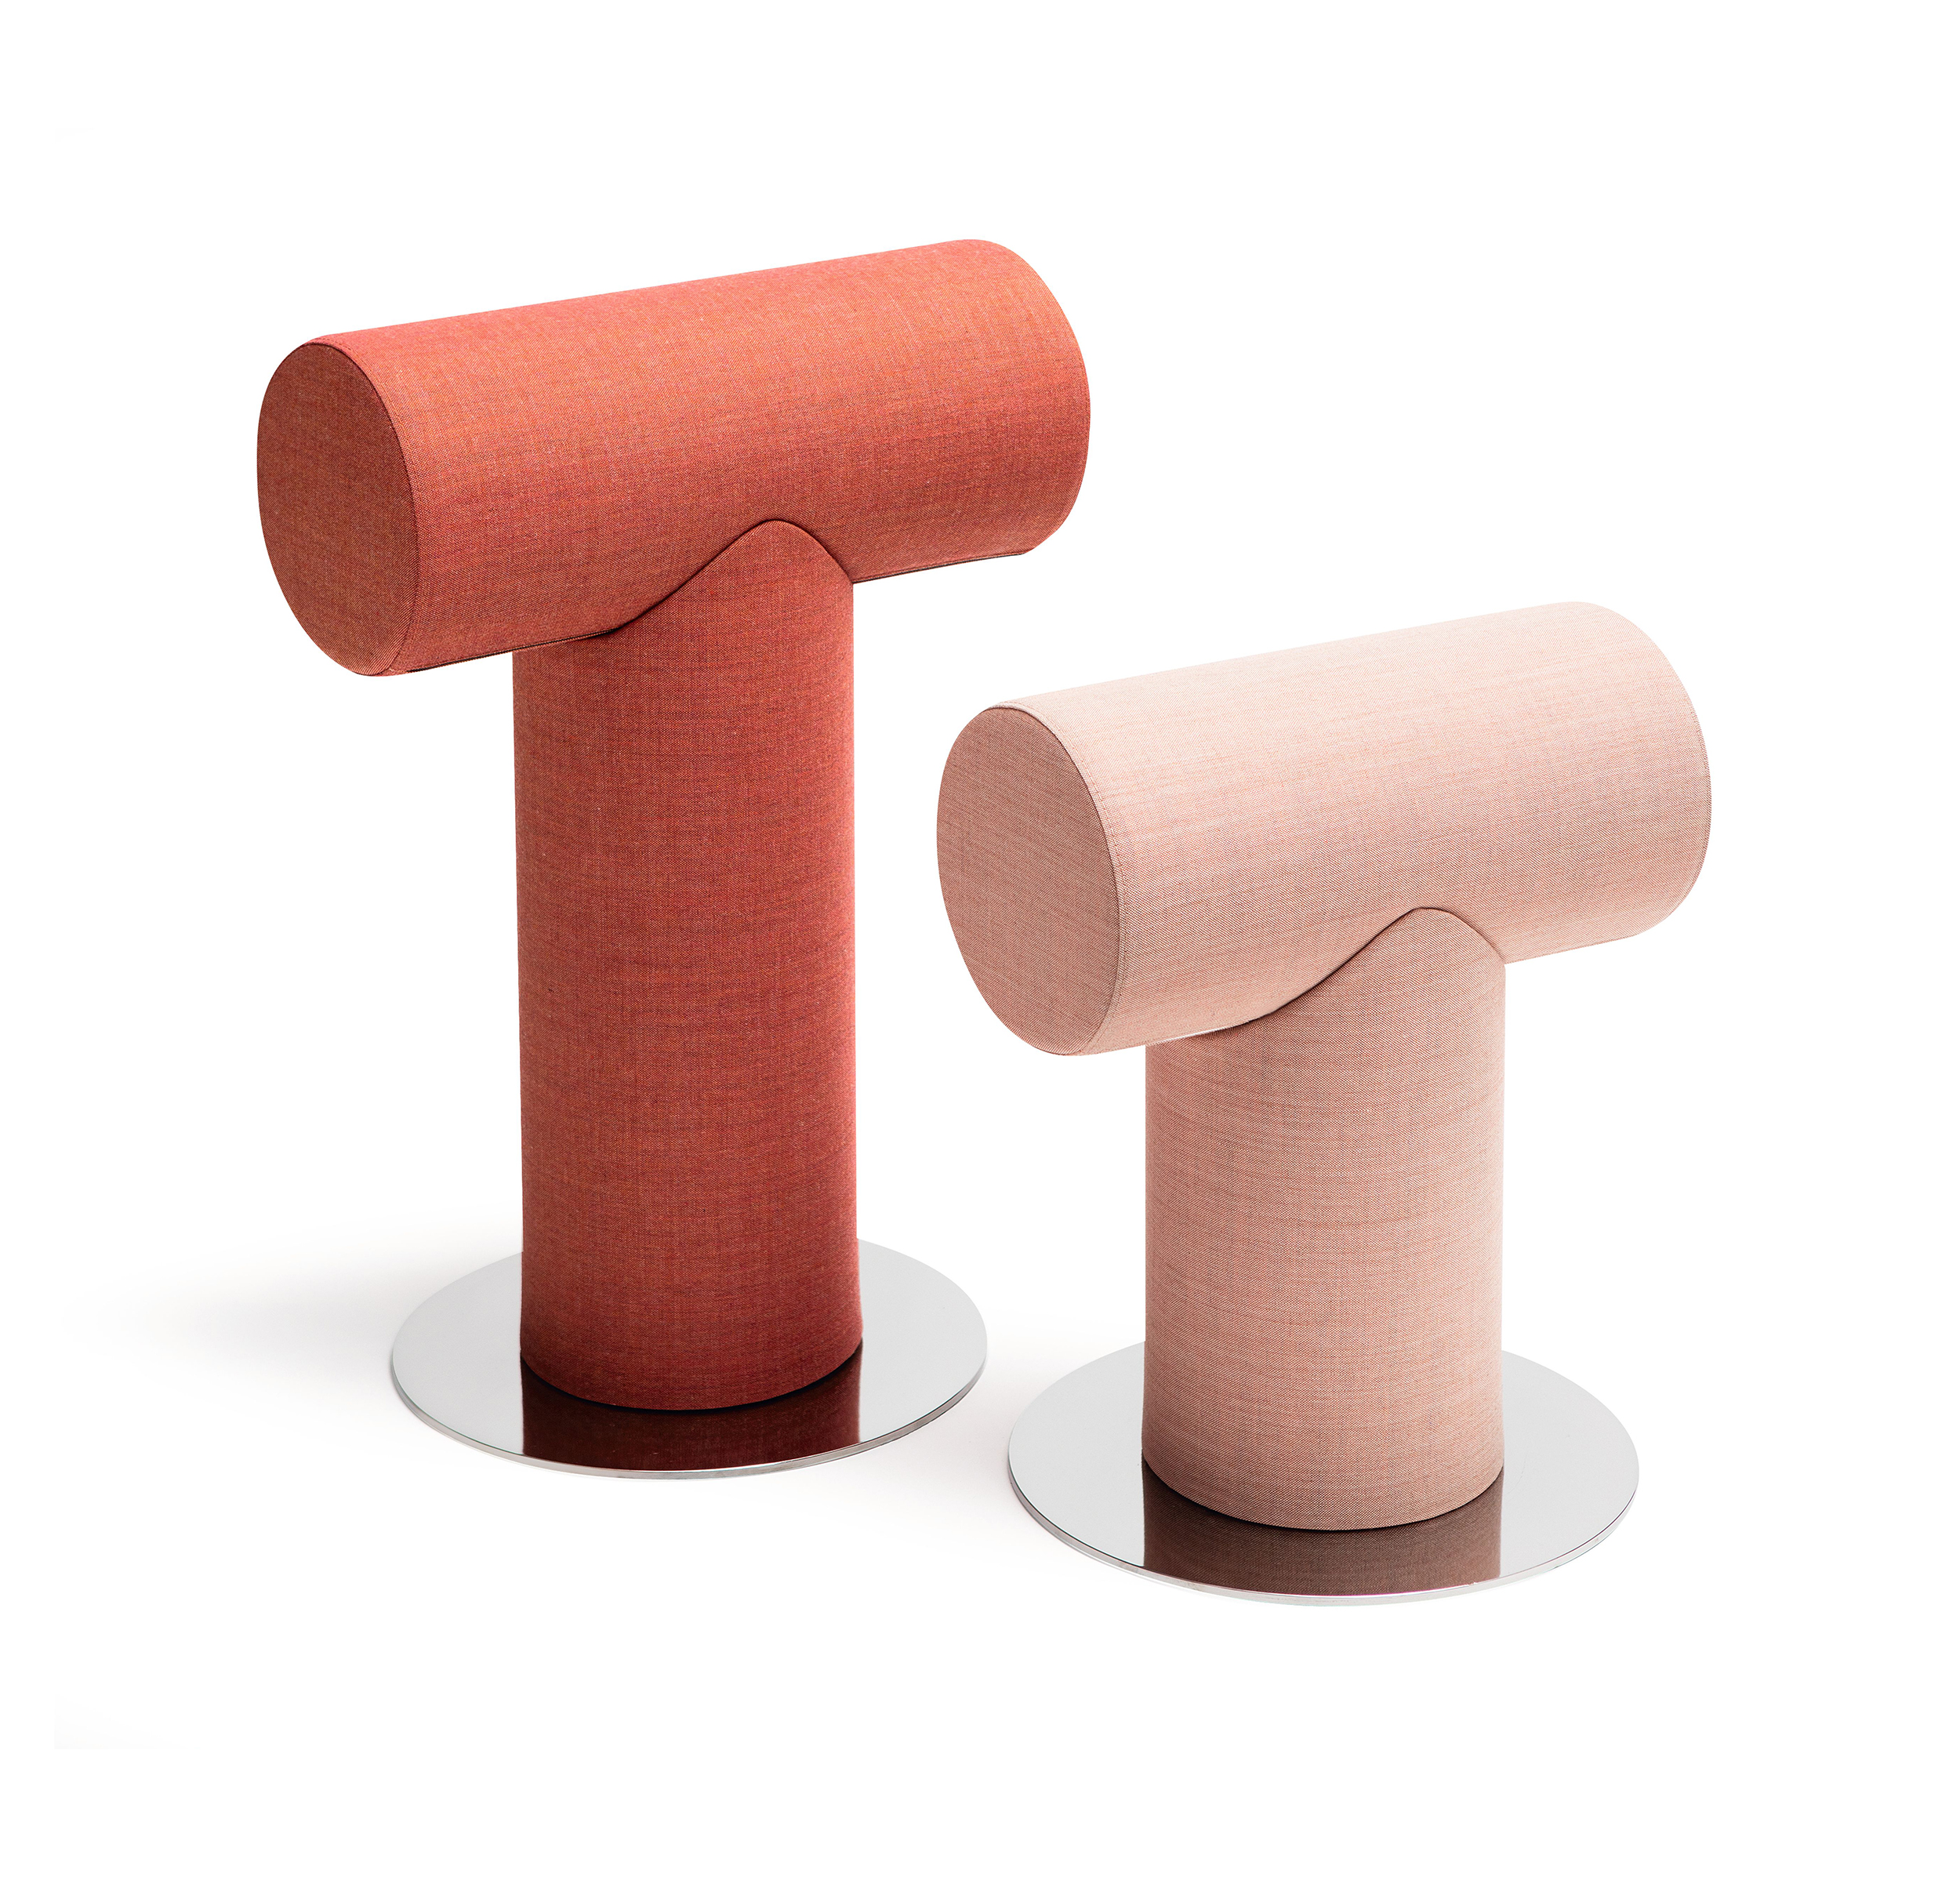 MATERIA-Mr-T-stool-h660-red-h480-pink.jpg